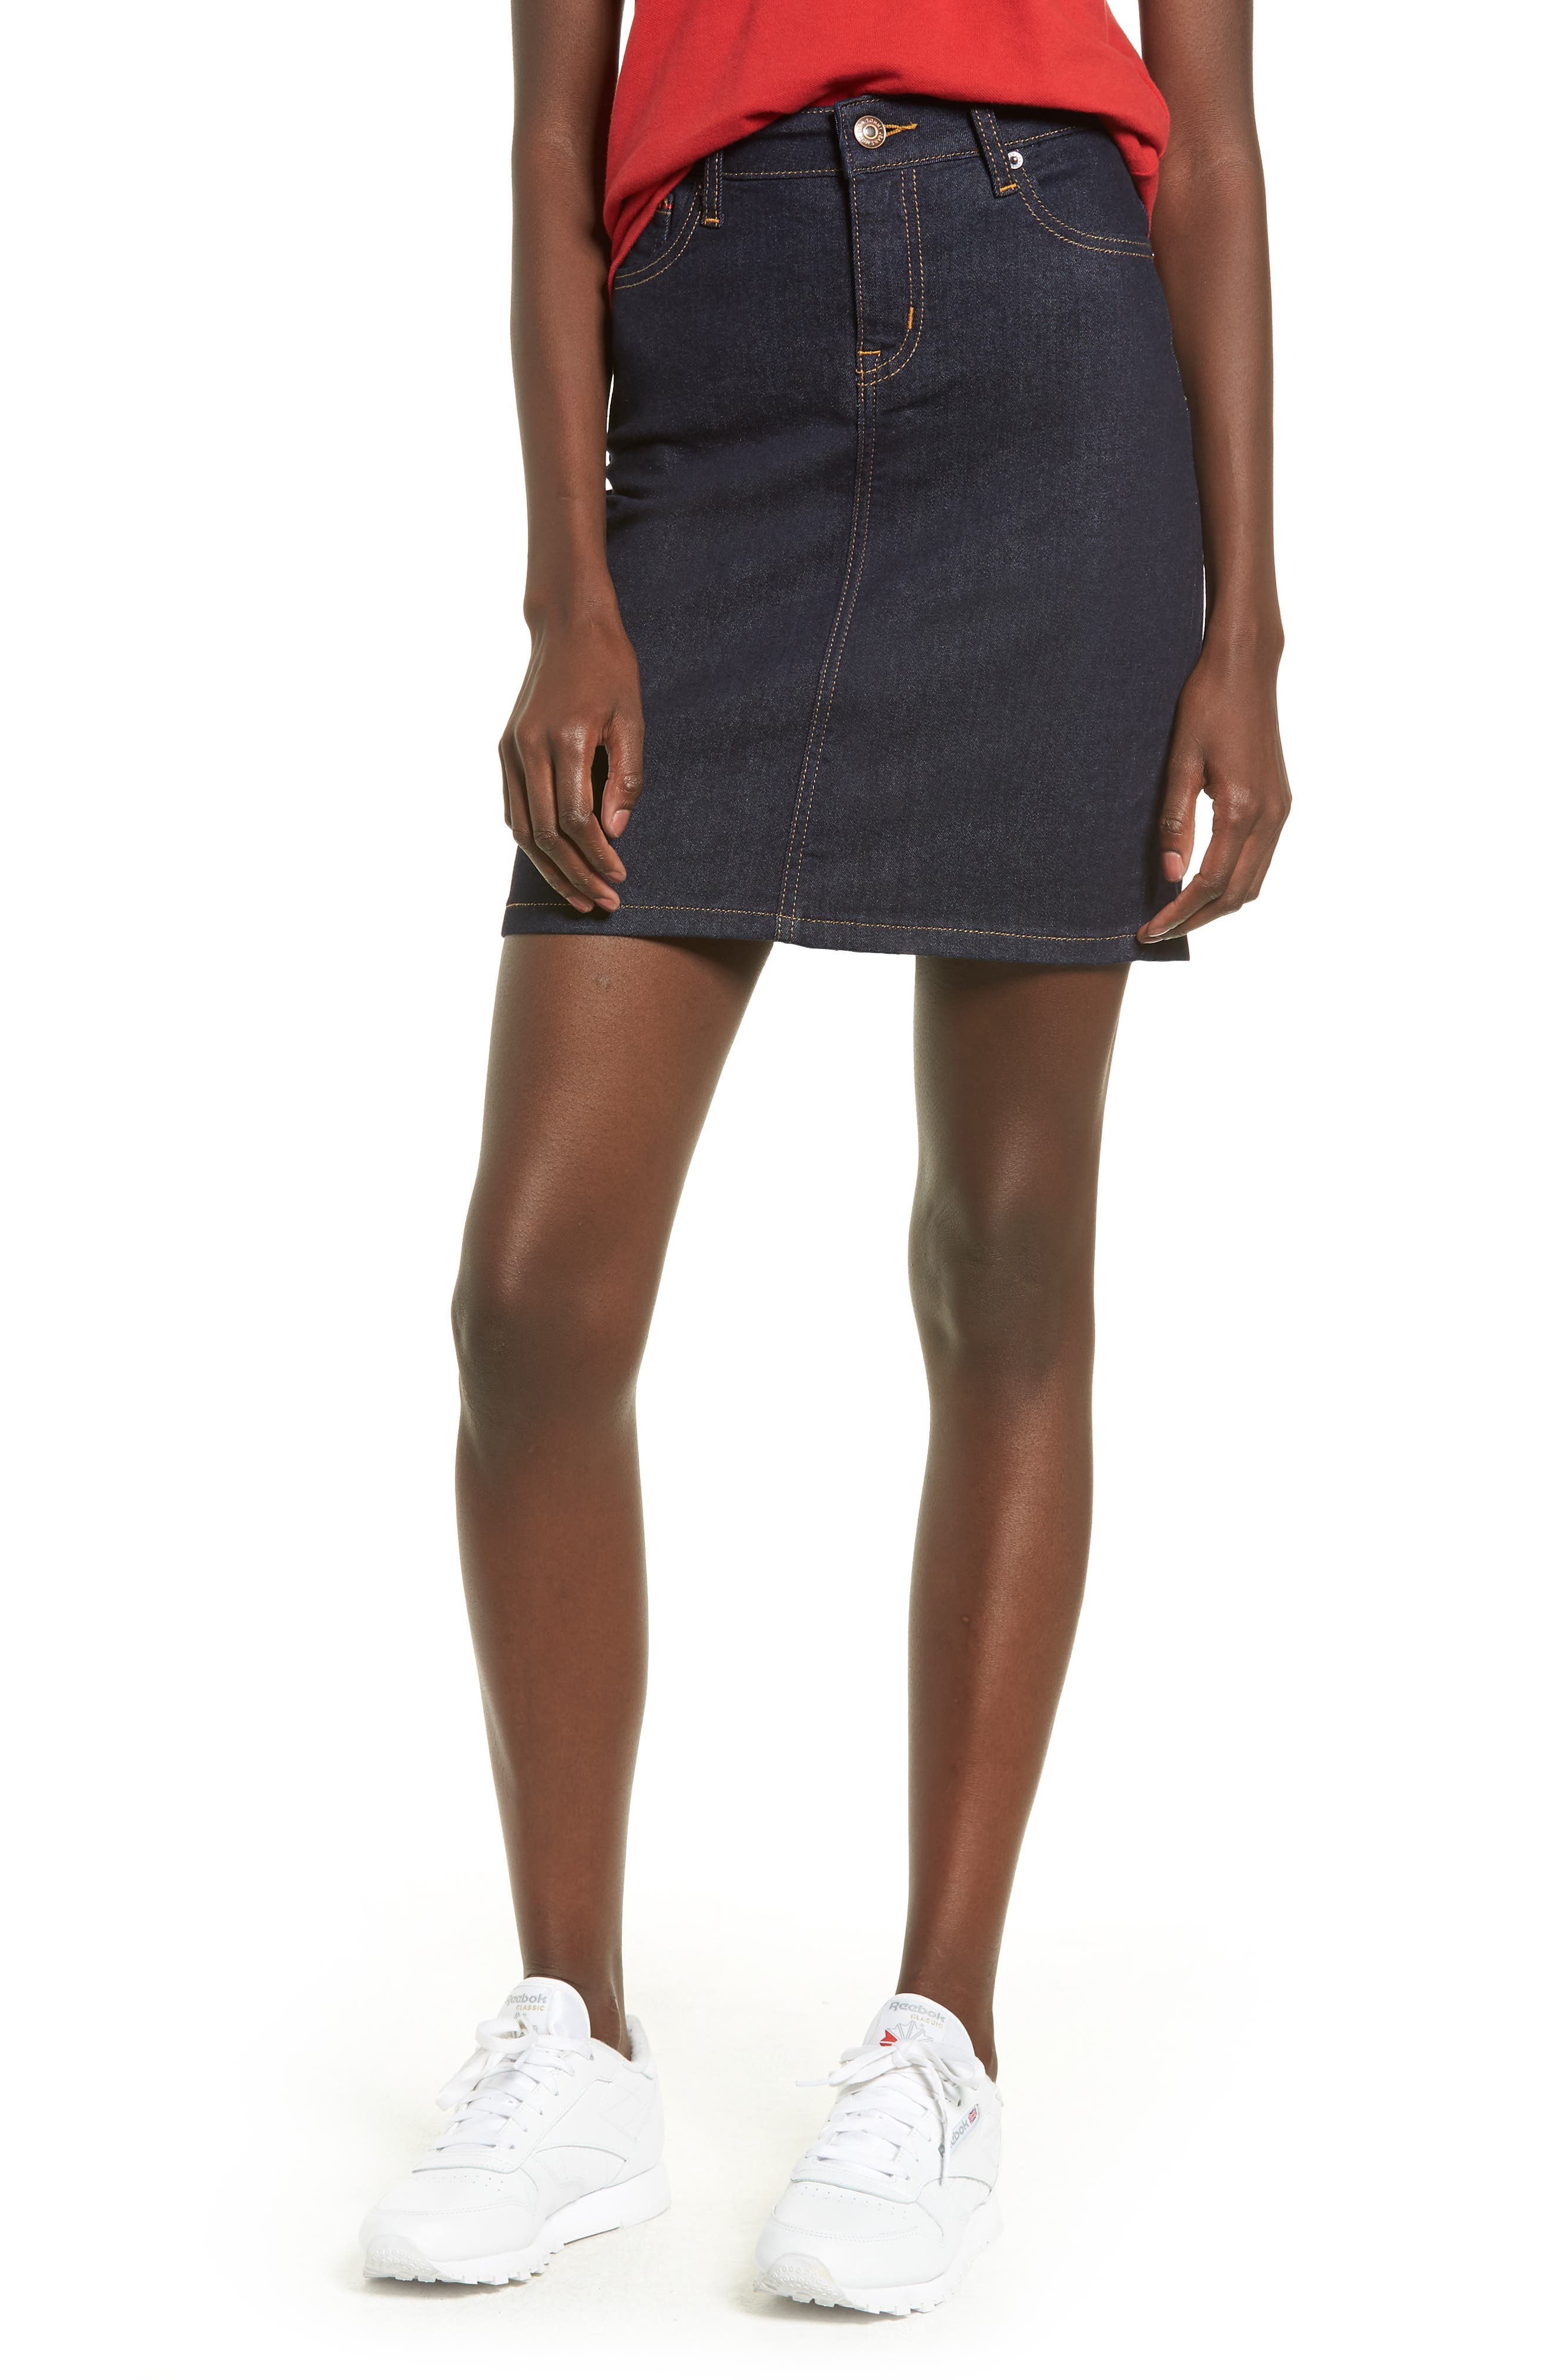 Tommy Jeans Denim Skirt, 7 - Black